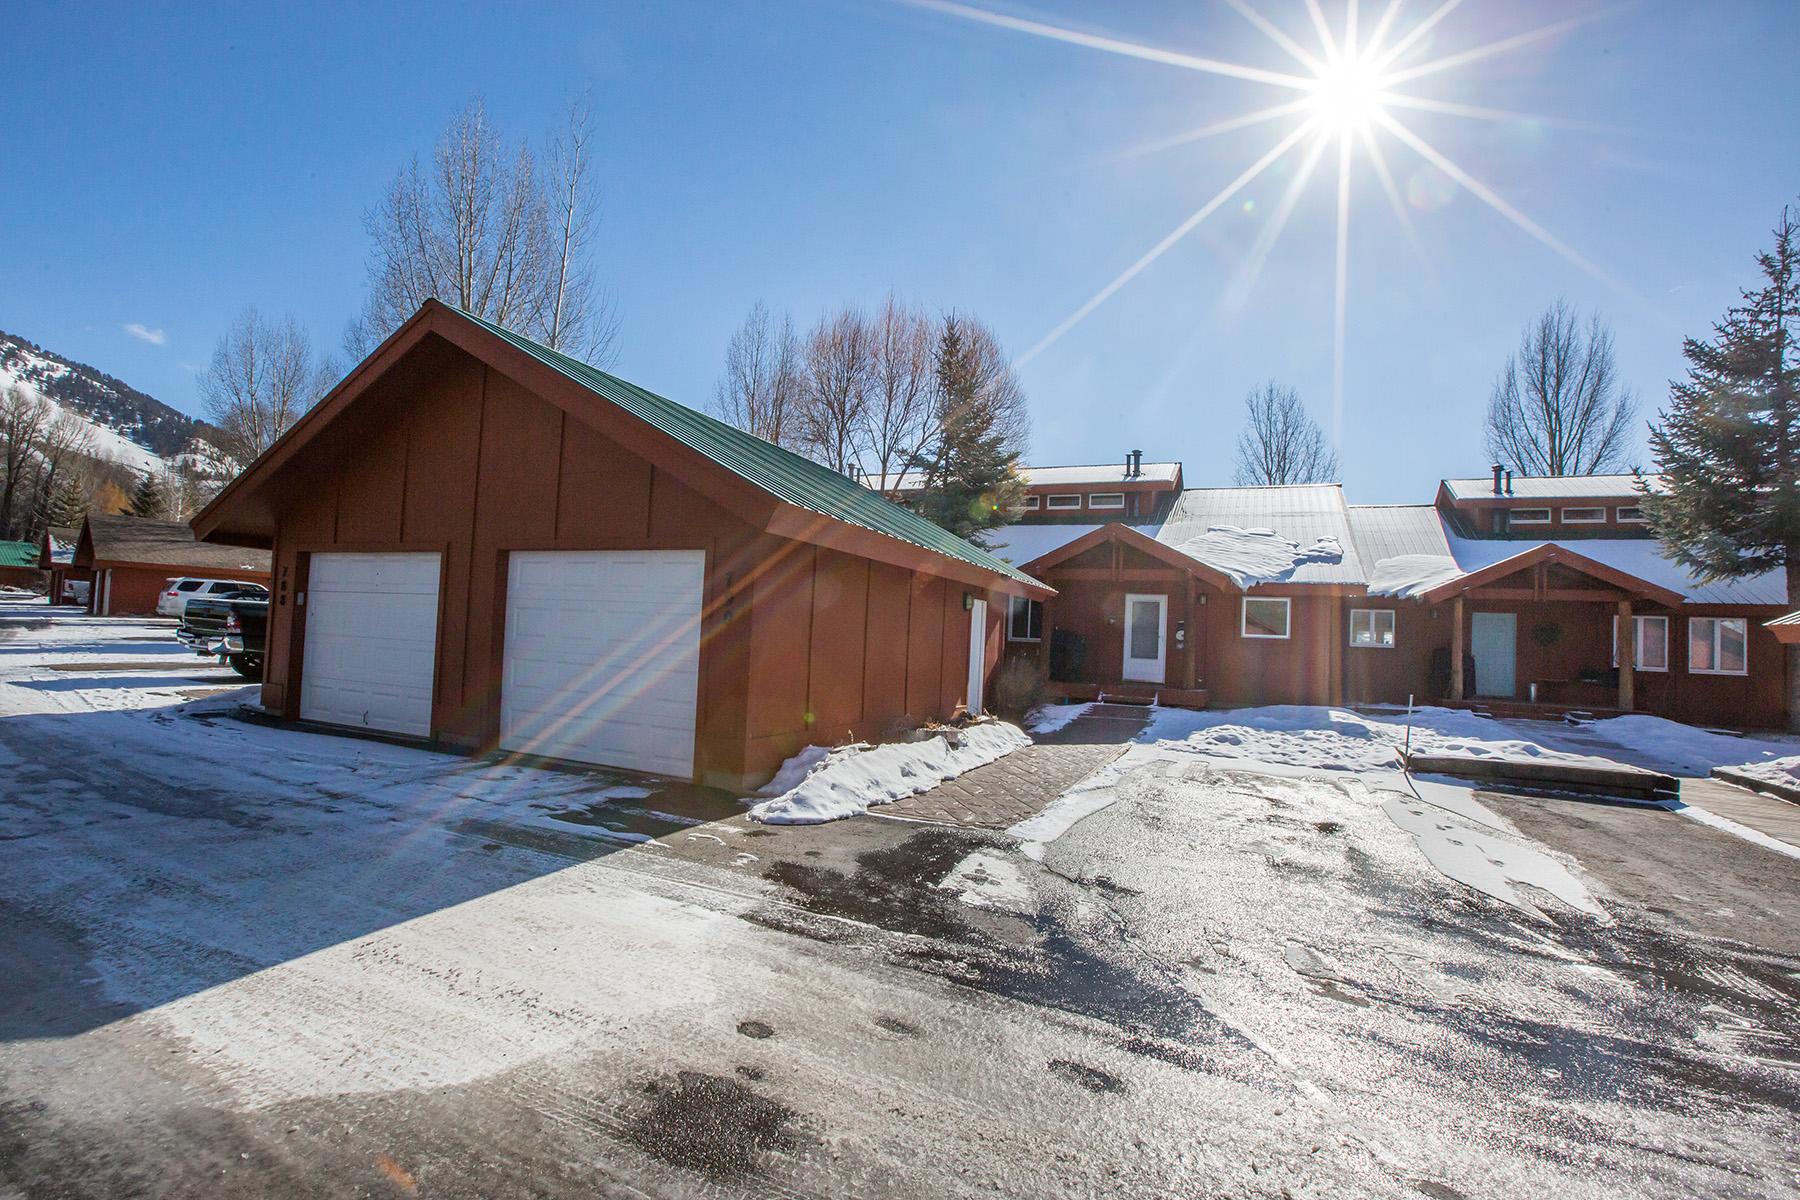 独户住宅 为 销售 在 Rare opportunity in Melody Ranch 790 W WIND RIVER LN,, 杰克逊, 怀俄明州, 83001 Jackson Hole, 美国